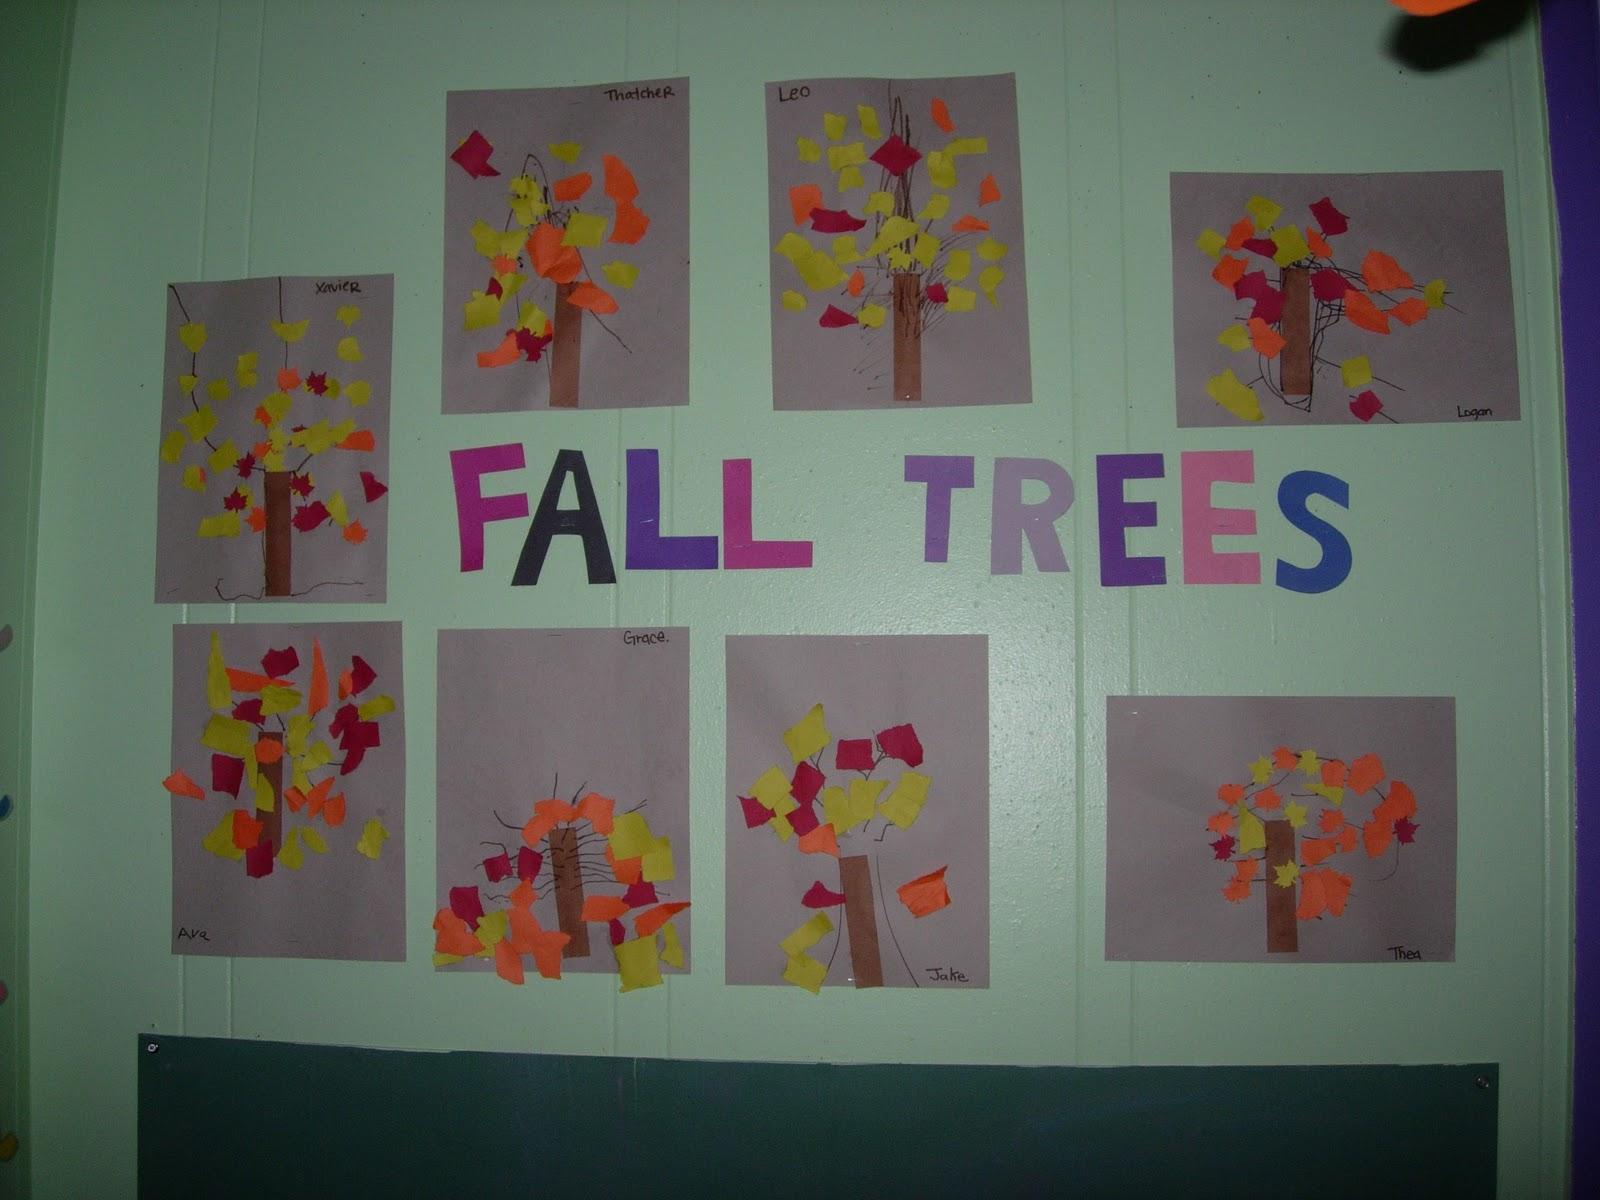 Harvest Theme Preschool Classroom Theme Preschool Ideas Teaching Preschool Classroom Themes